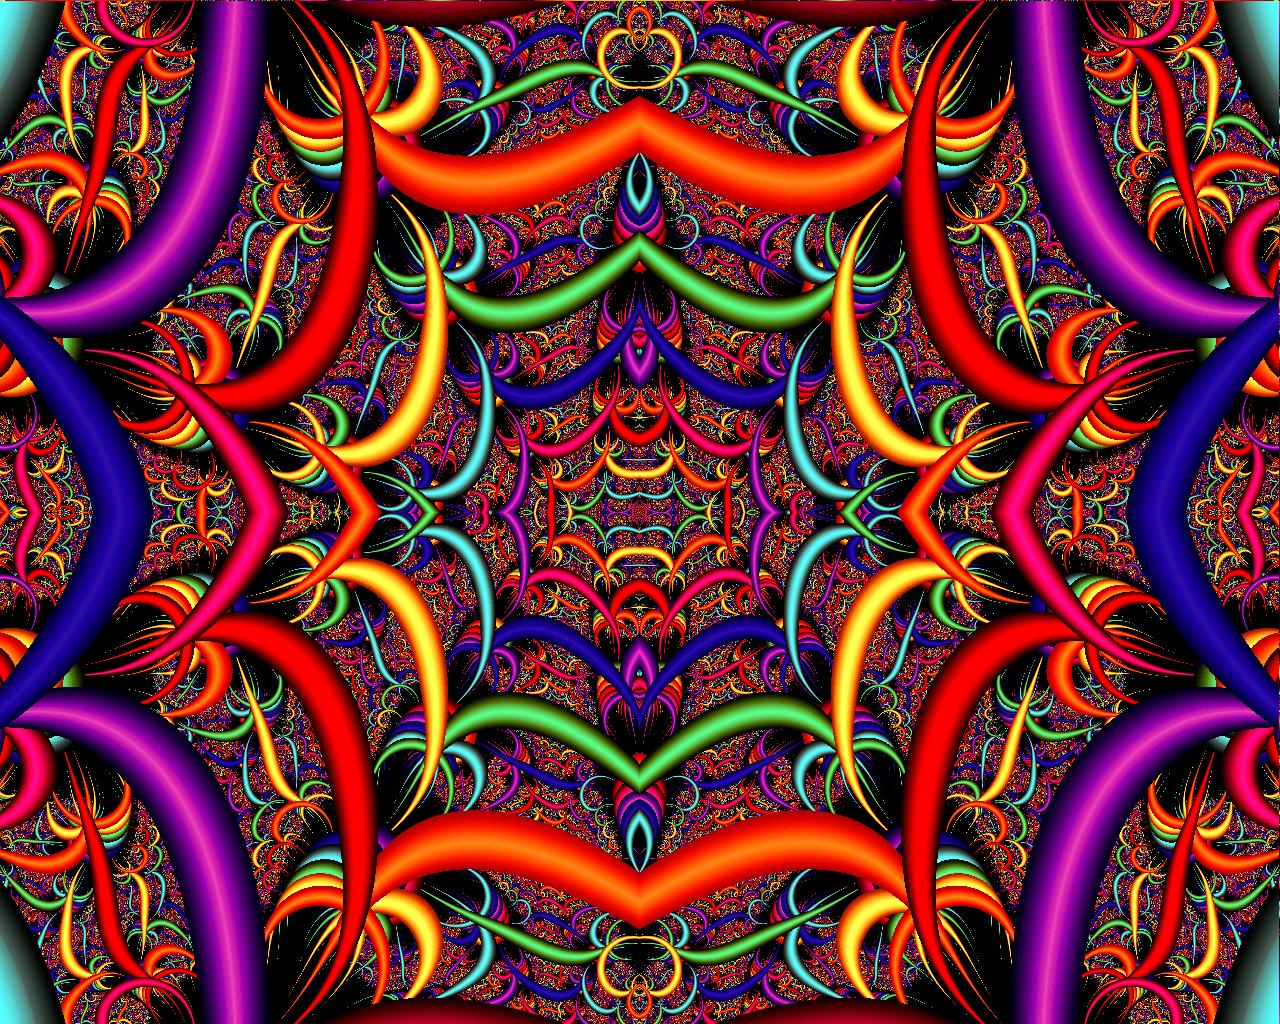 trippy psychedelic art | psychedelic holekram666 digital art